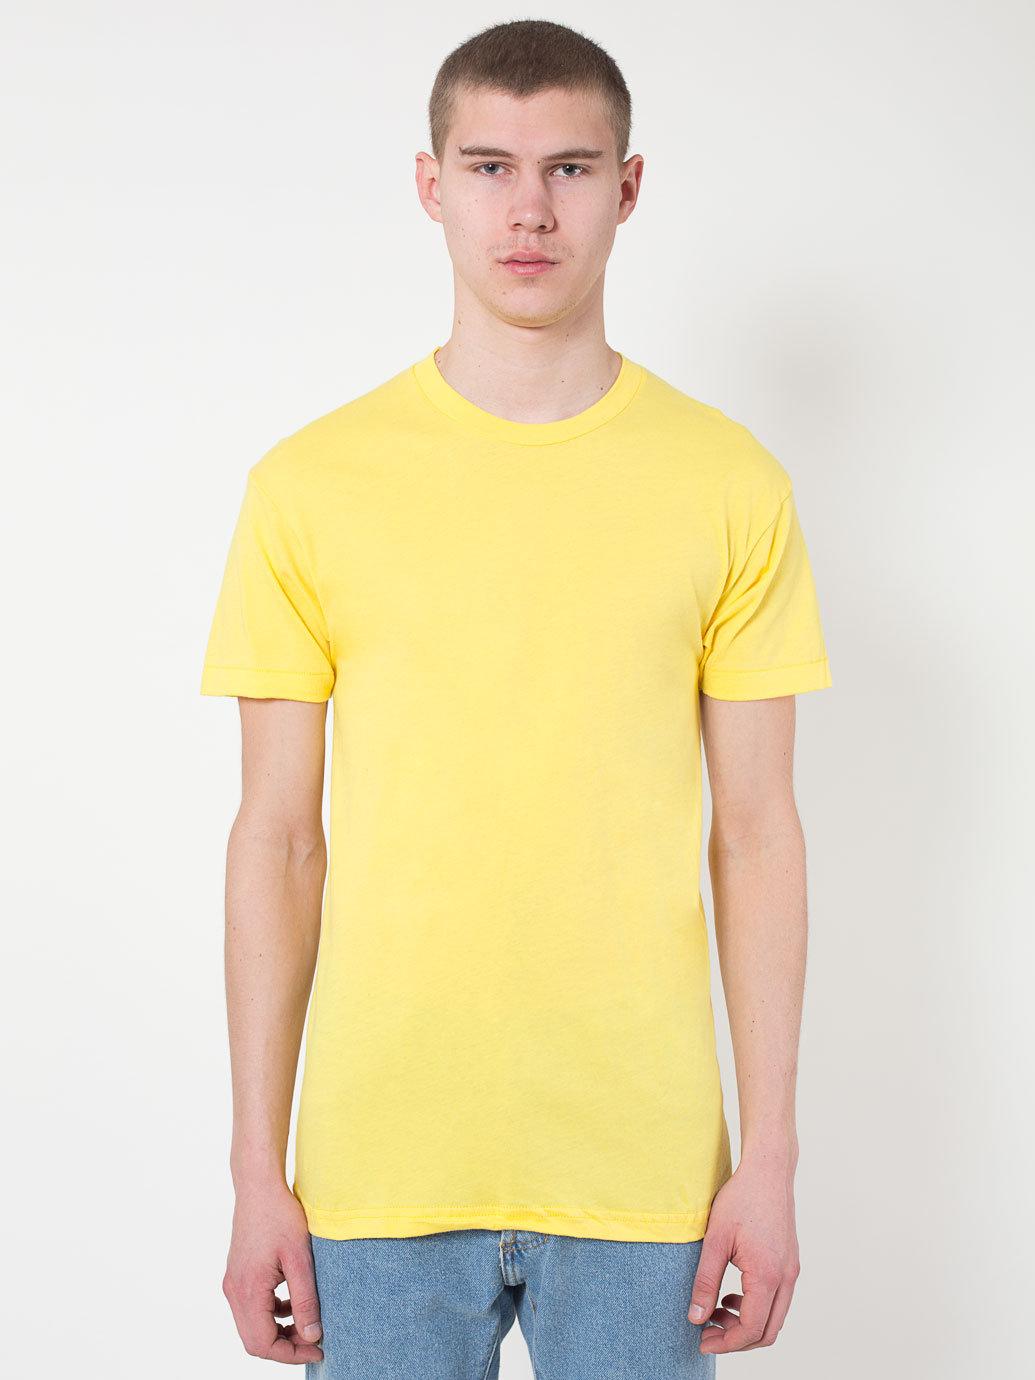 American apparel sheer jersey crewneck 39 summer 39 t shirt in for American apparel mesh shirt